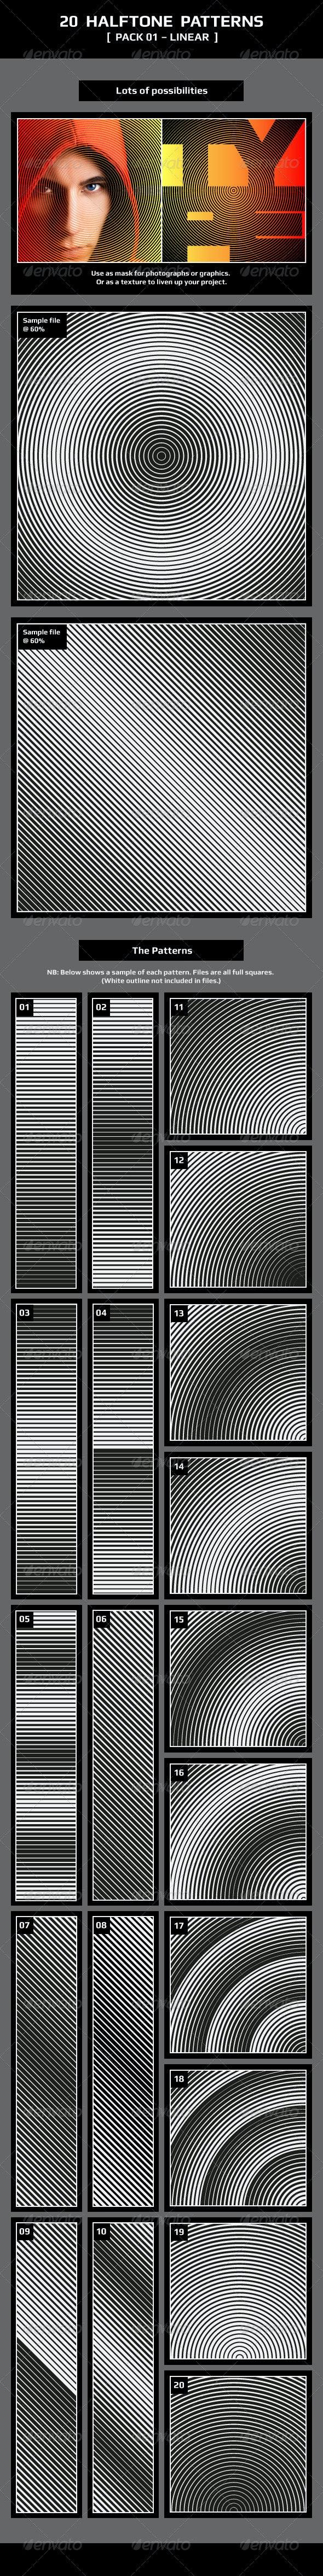 20 Halftone Patterns – Pack 01 – Linear - Patterns Decorative